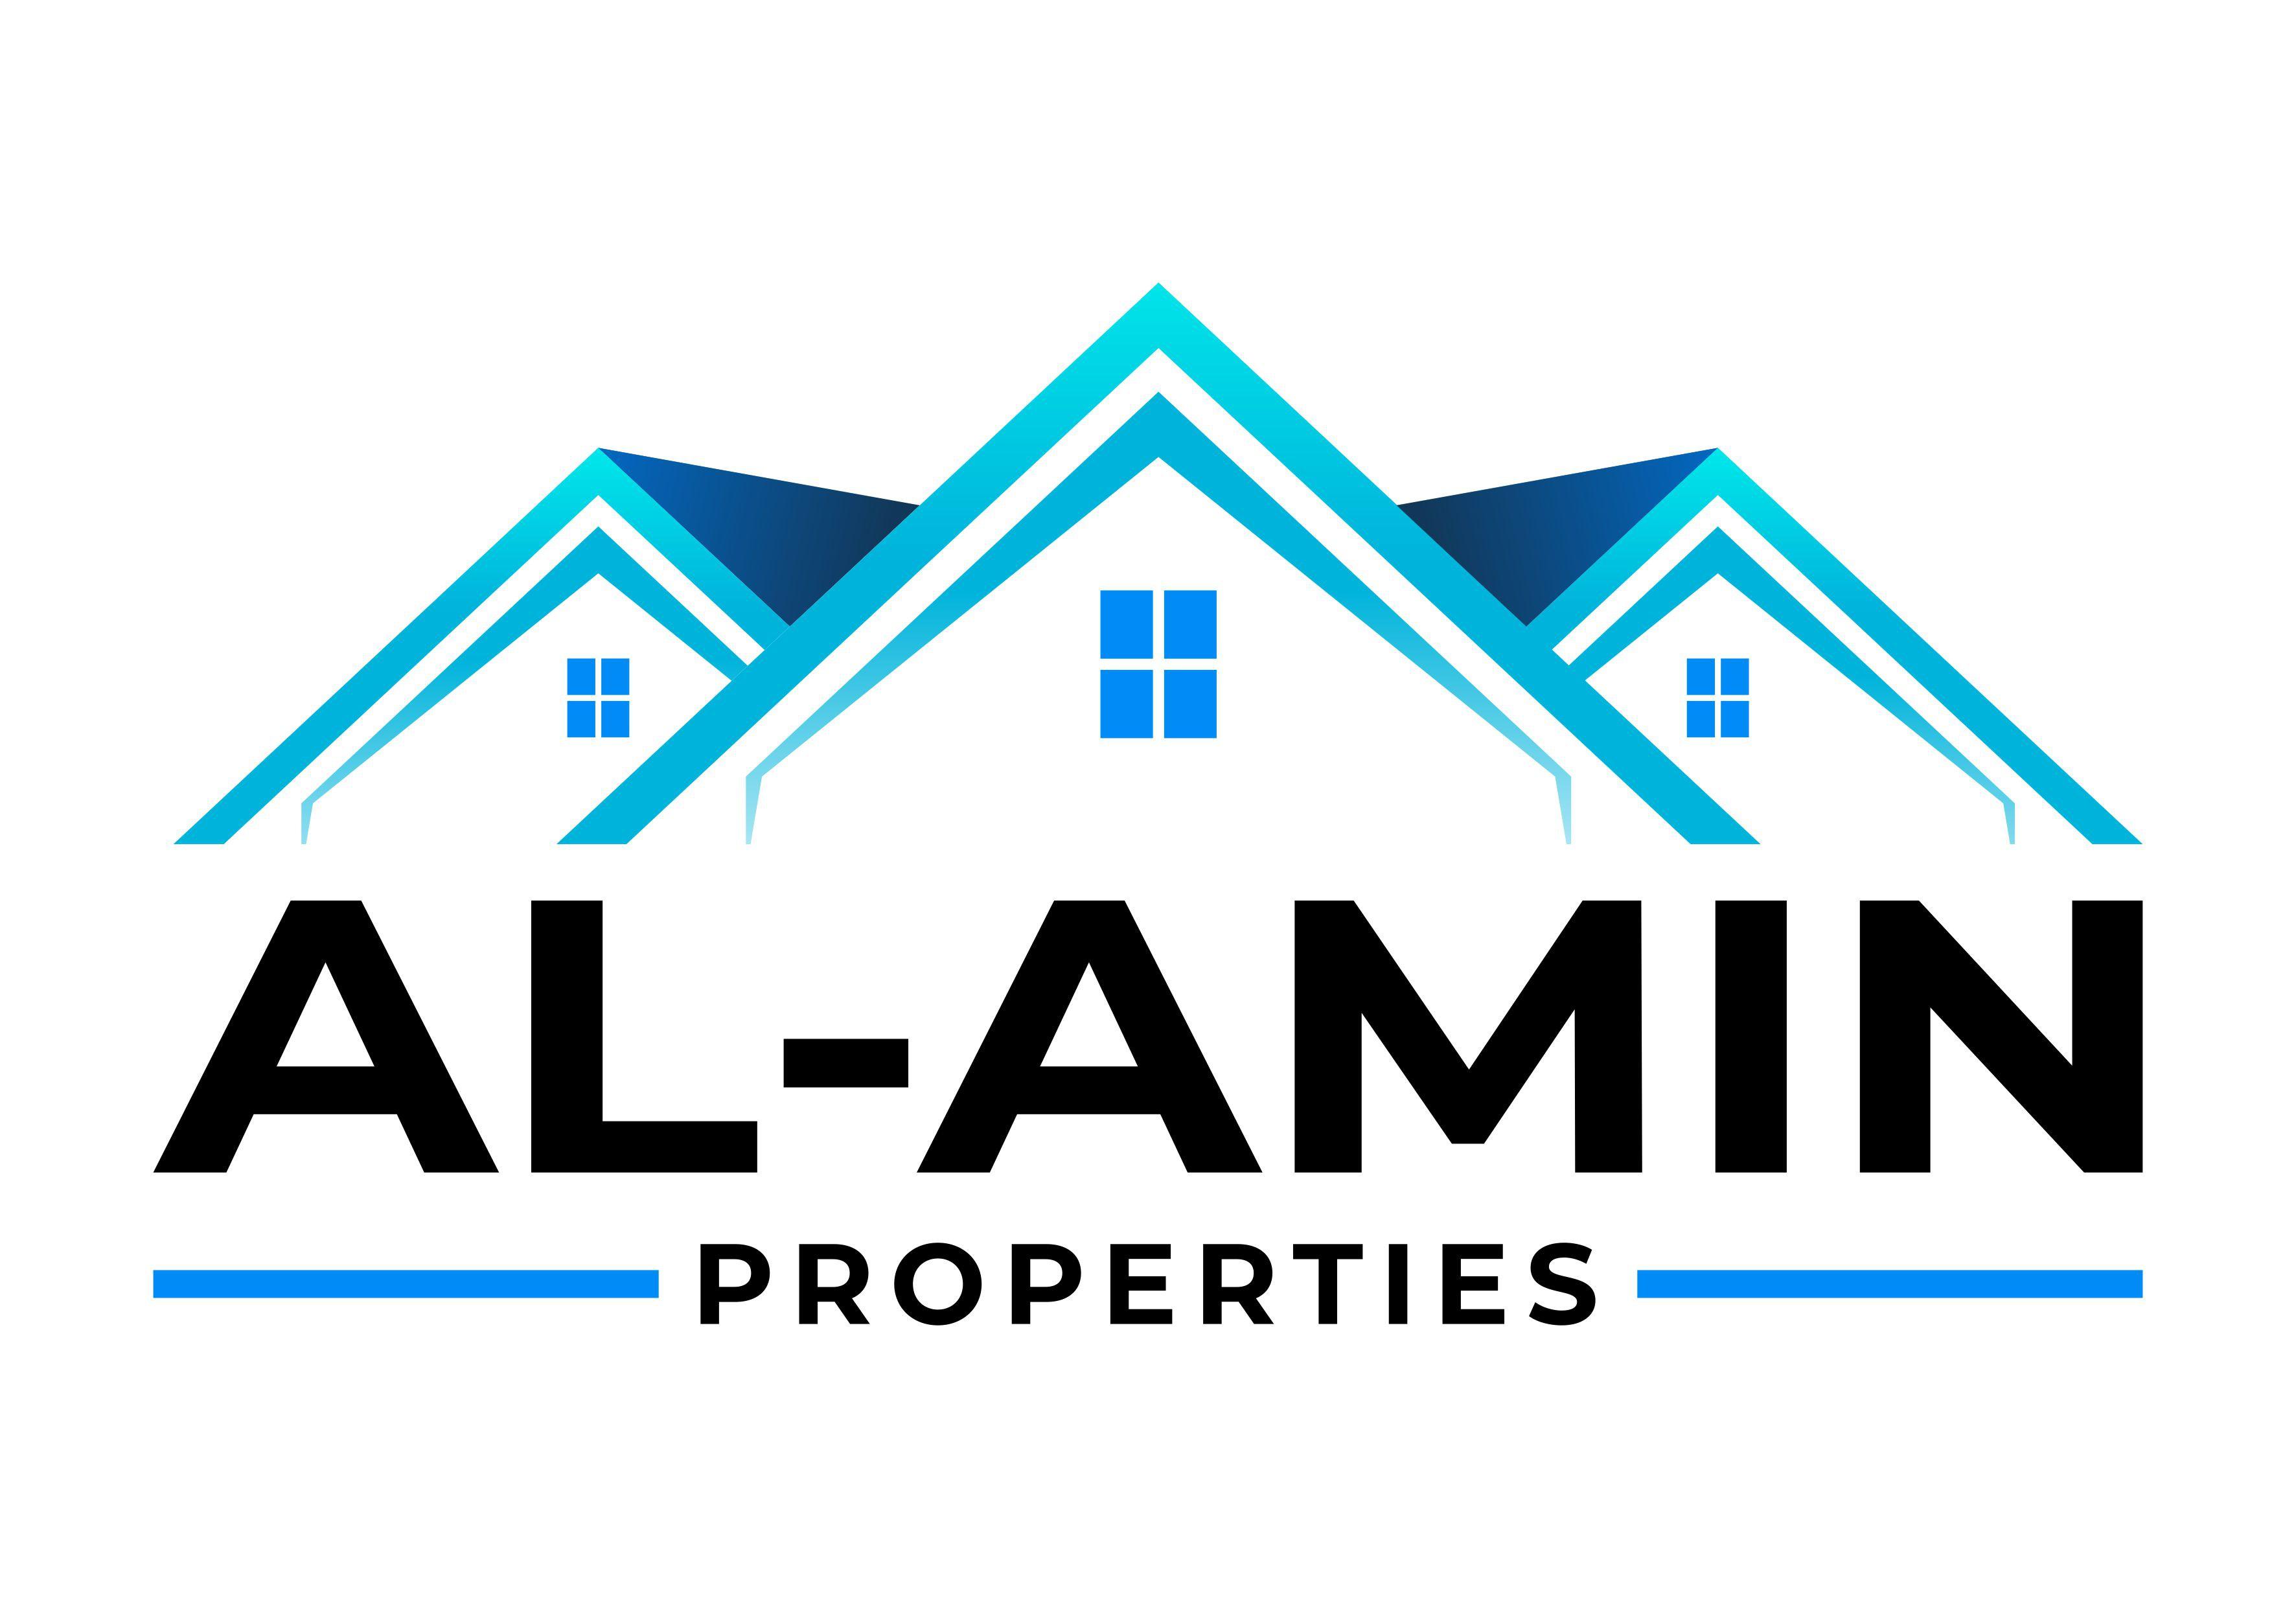 Create a clean, modern logo for Al-Amin properties